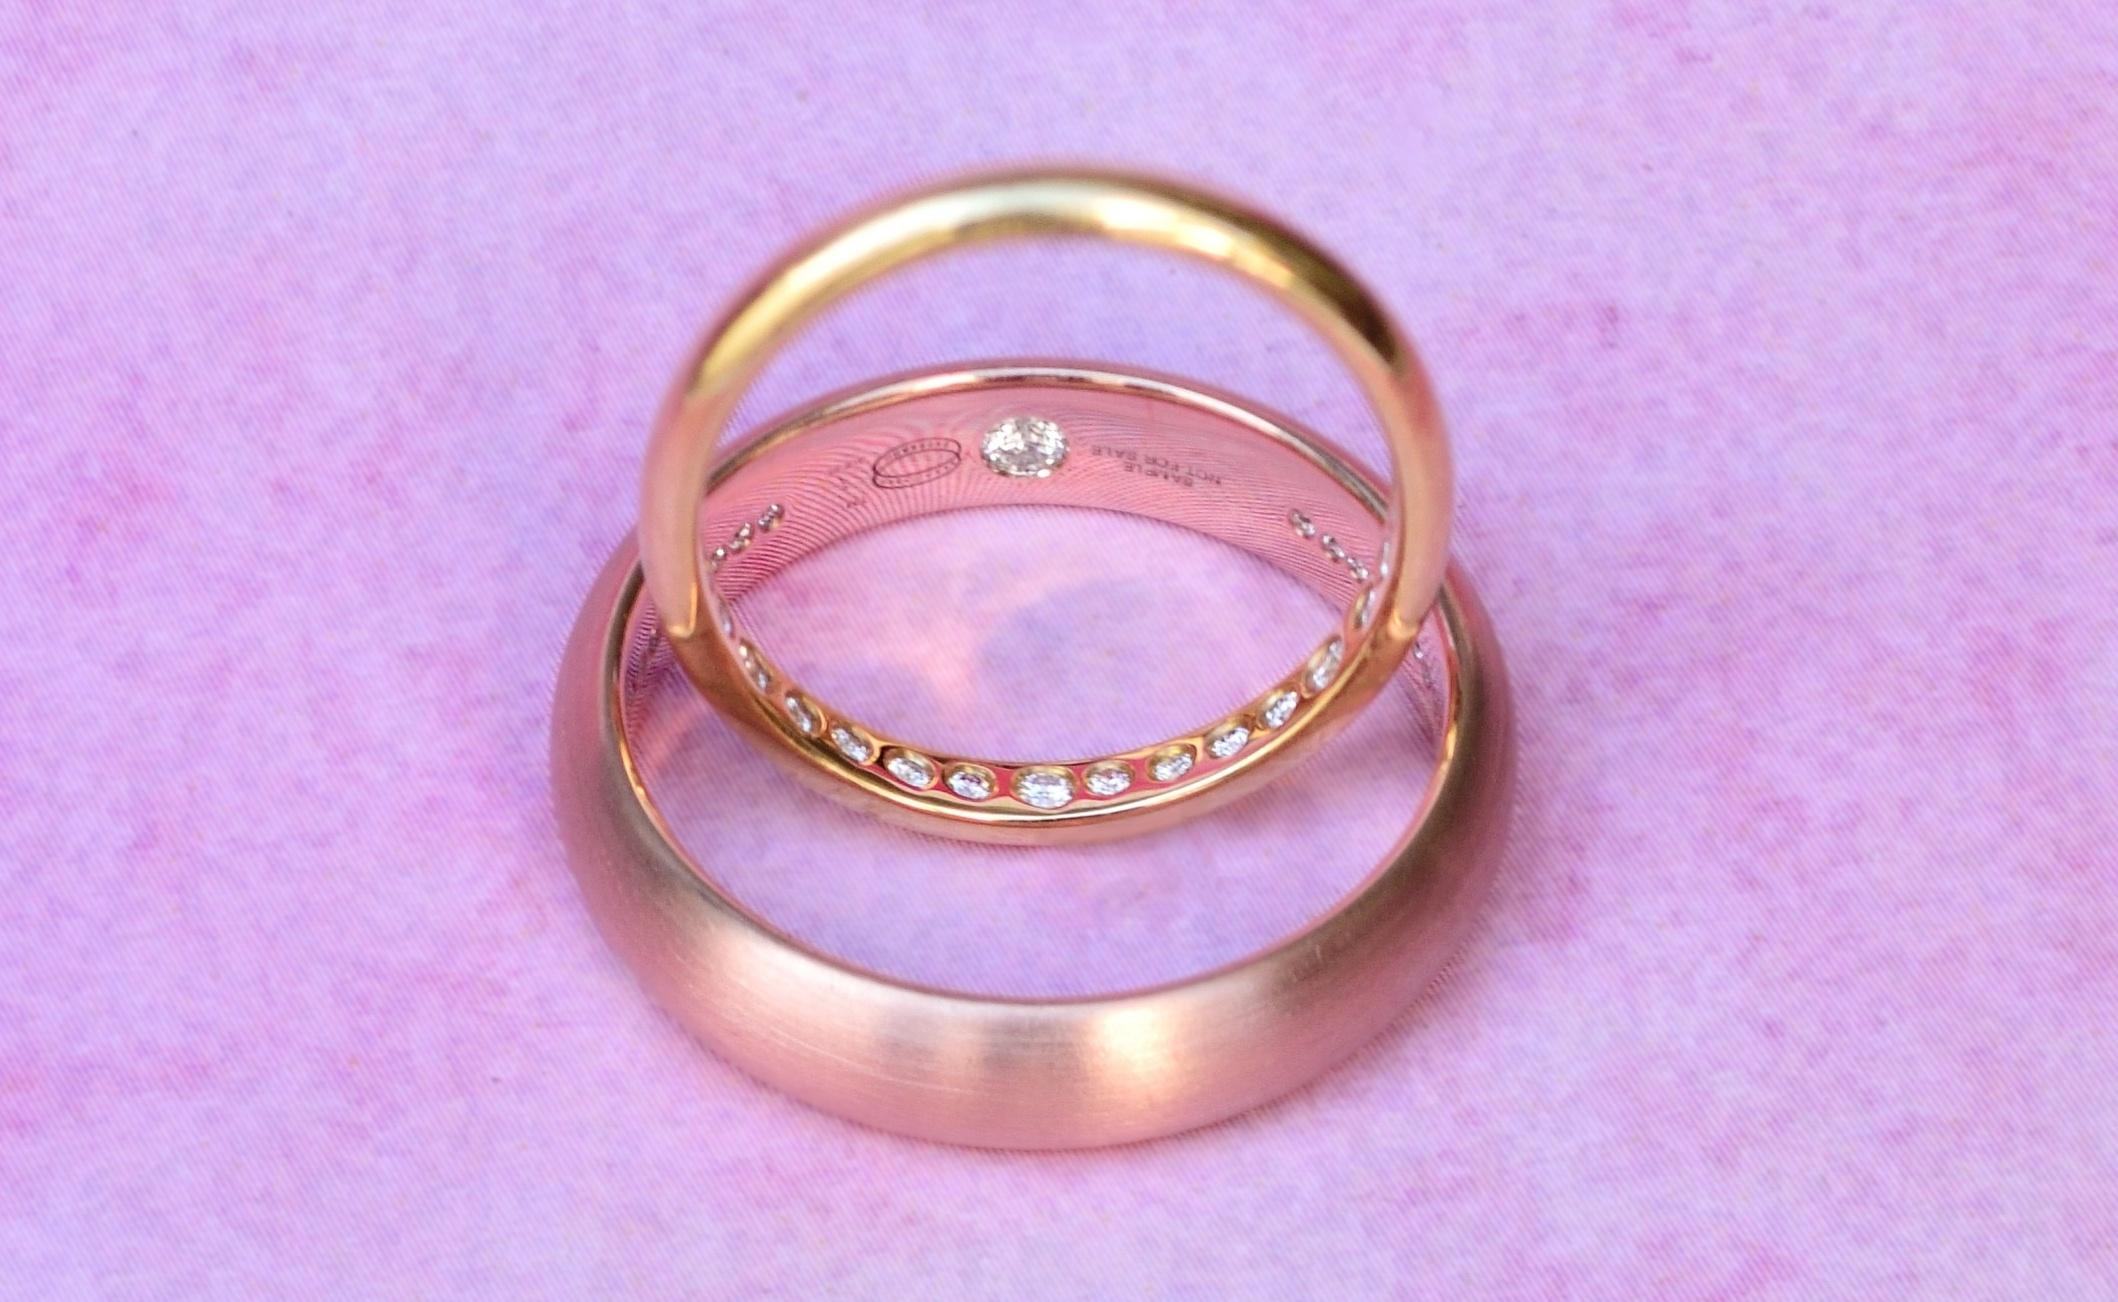 Add Diamonds & Gemstones In The Wedding Band